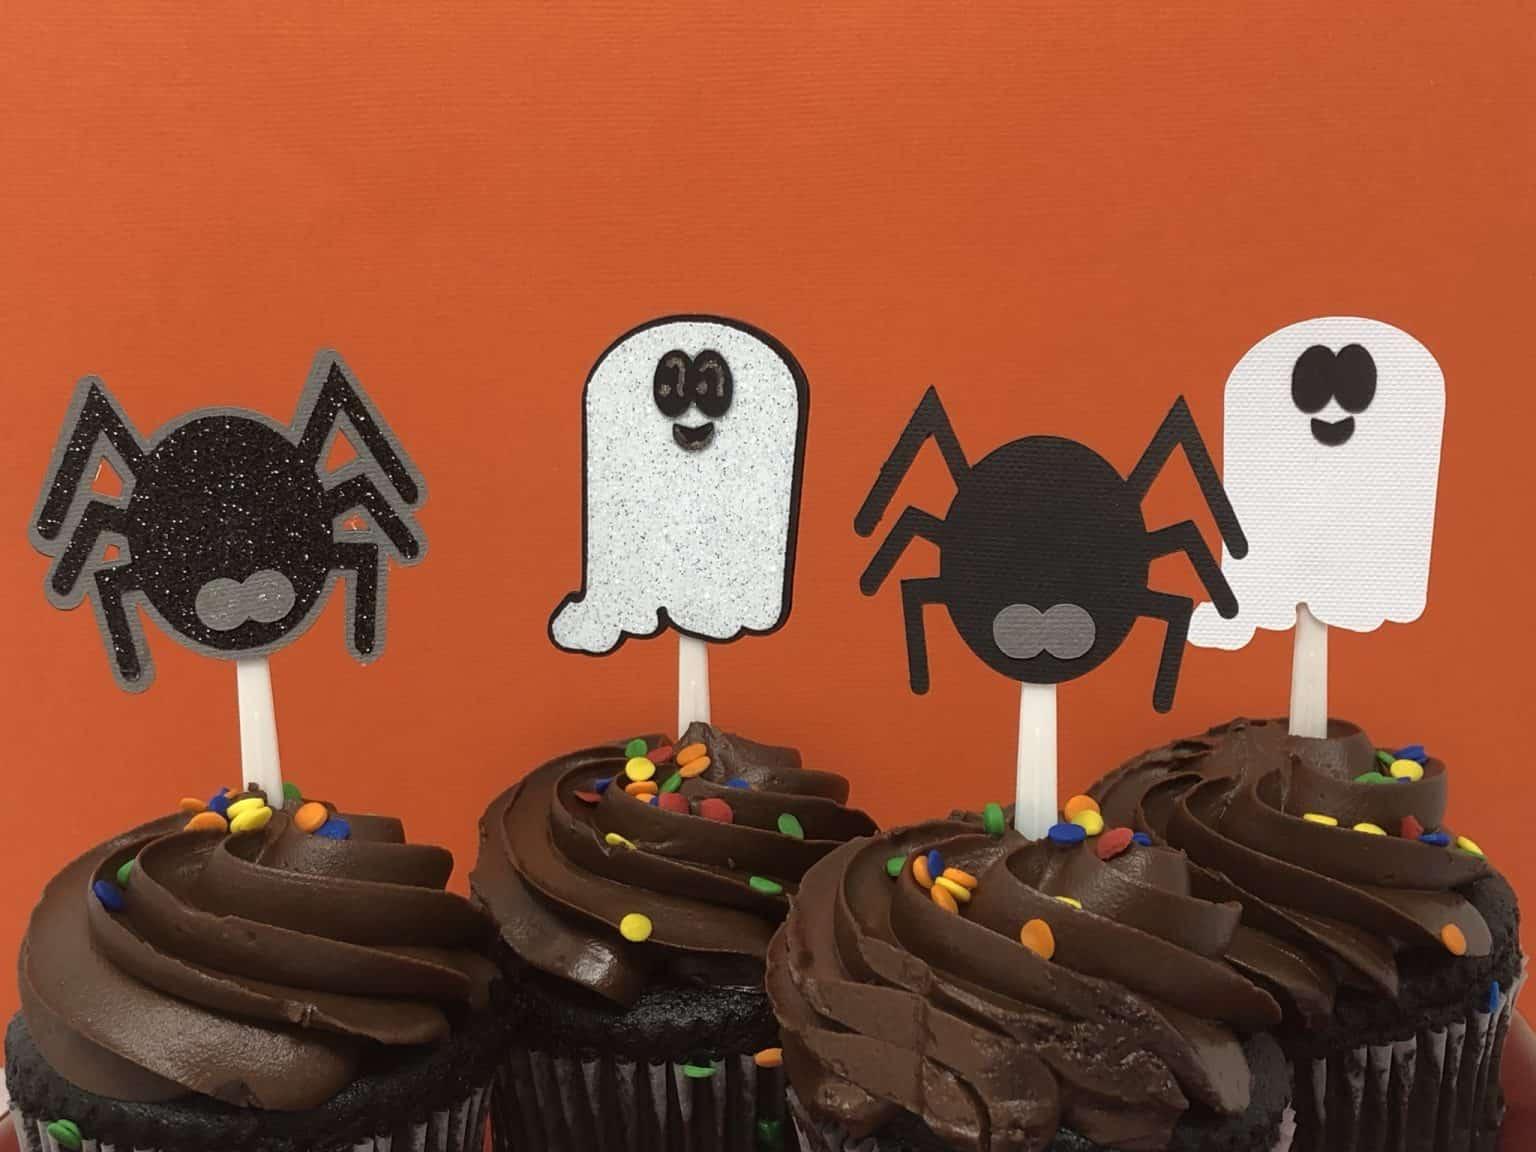 using cricut offset versus not using cricut offset on cupcake toppers